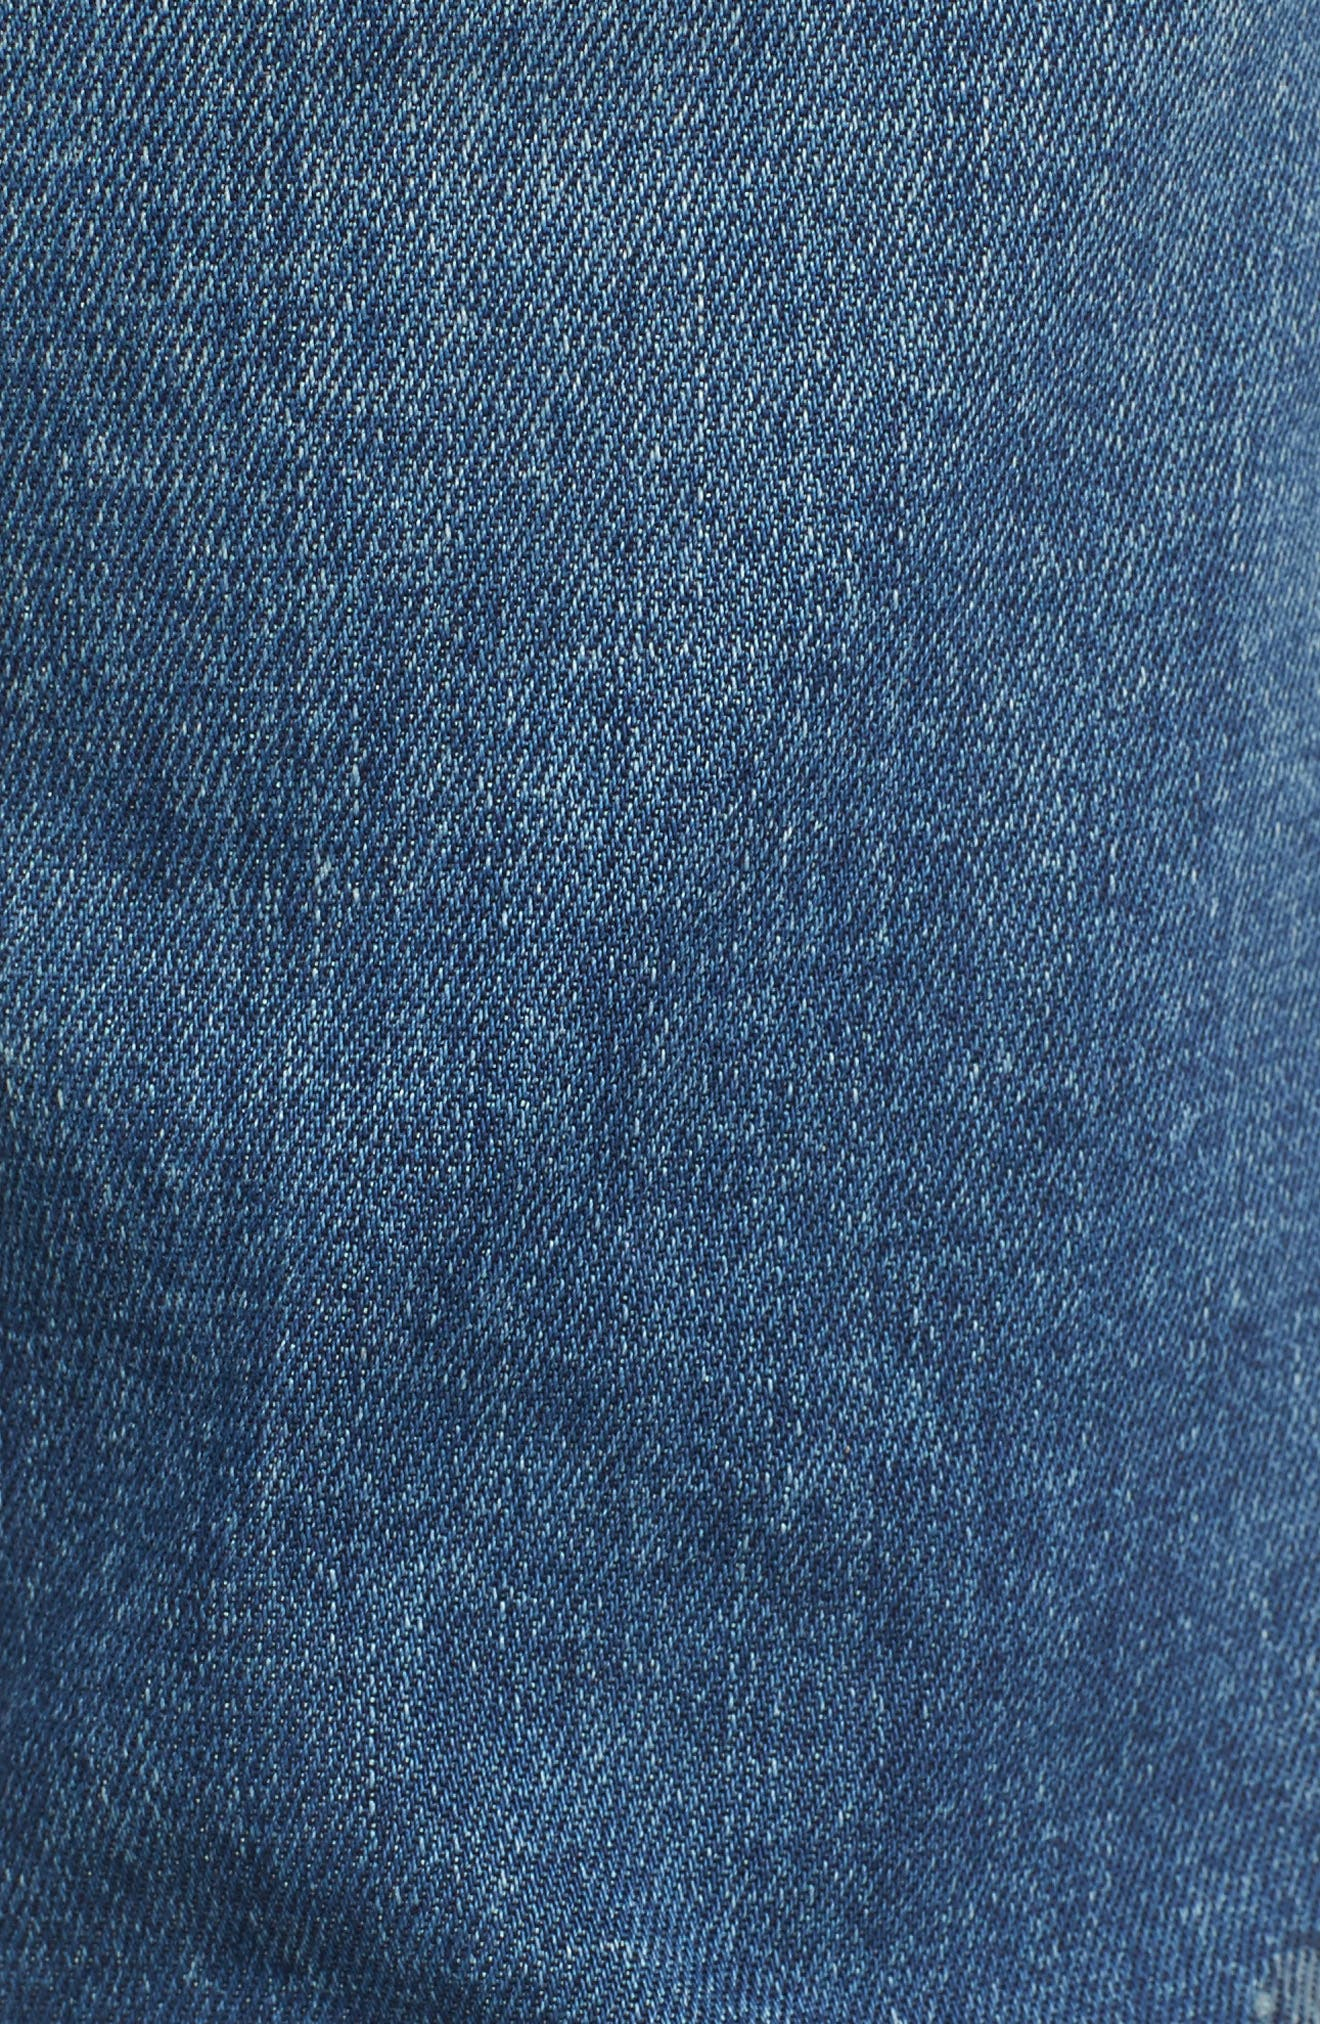 Slim Skinny Fit Jeans,                             Alternate thumbnail 5, color,